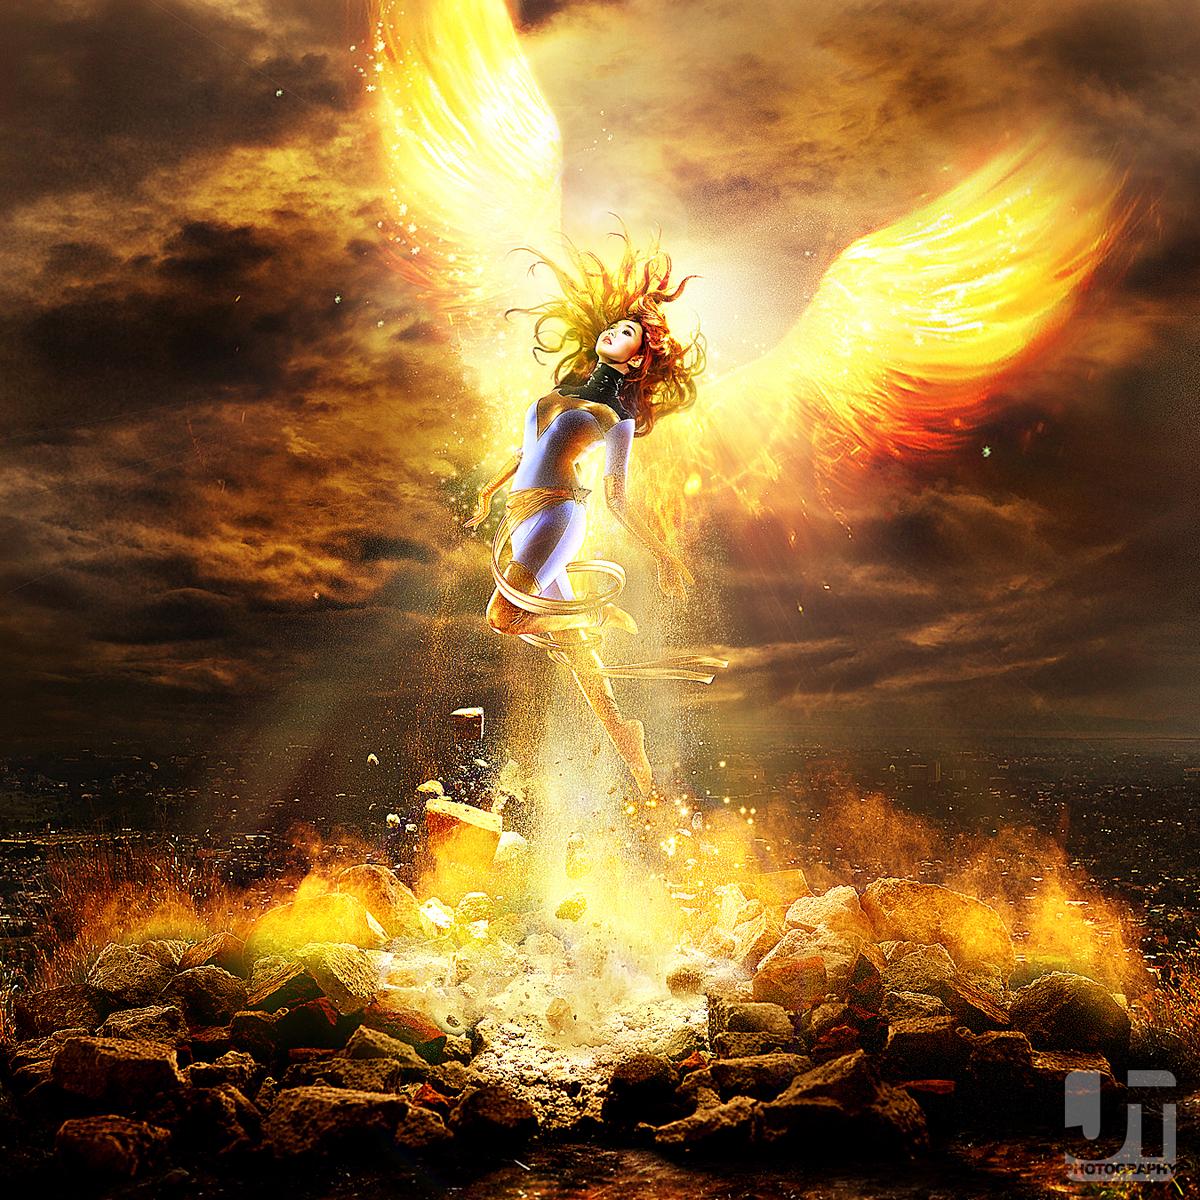 jay tablante unleashes white phoenix joris